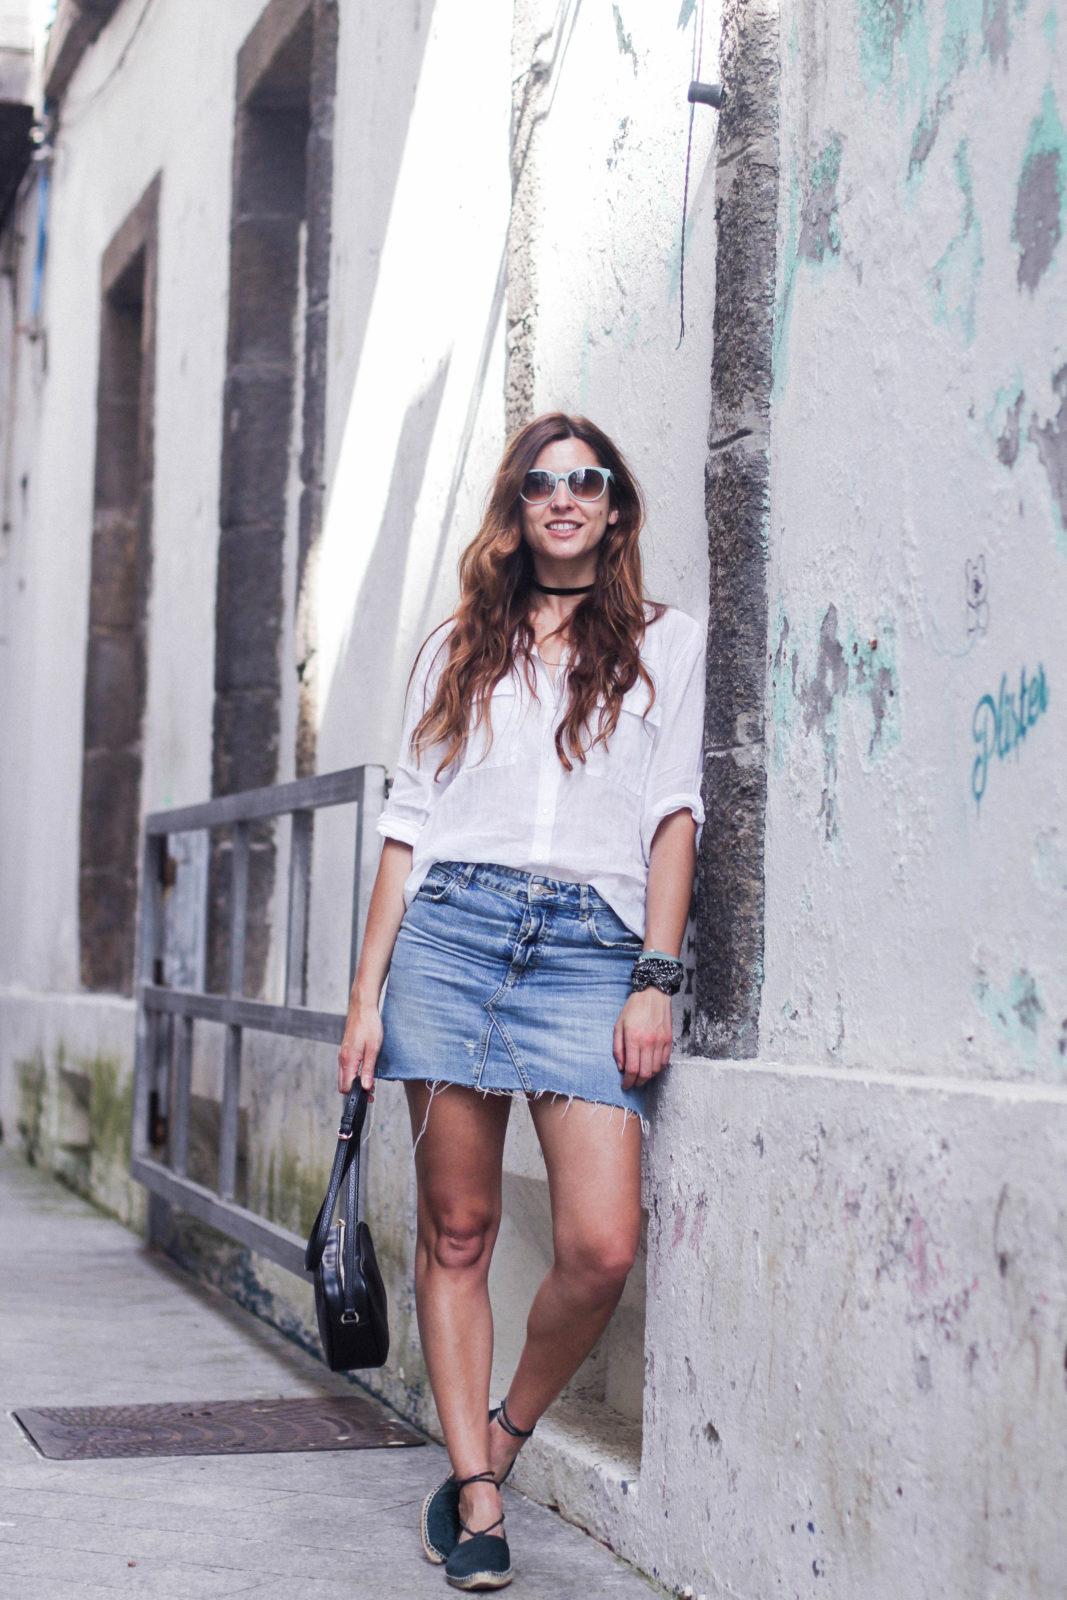 denim_skirt_falda_vaquera_camisa_blanca_alpargatas_espadrilles_look_summer_2016_street_style-24